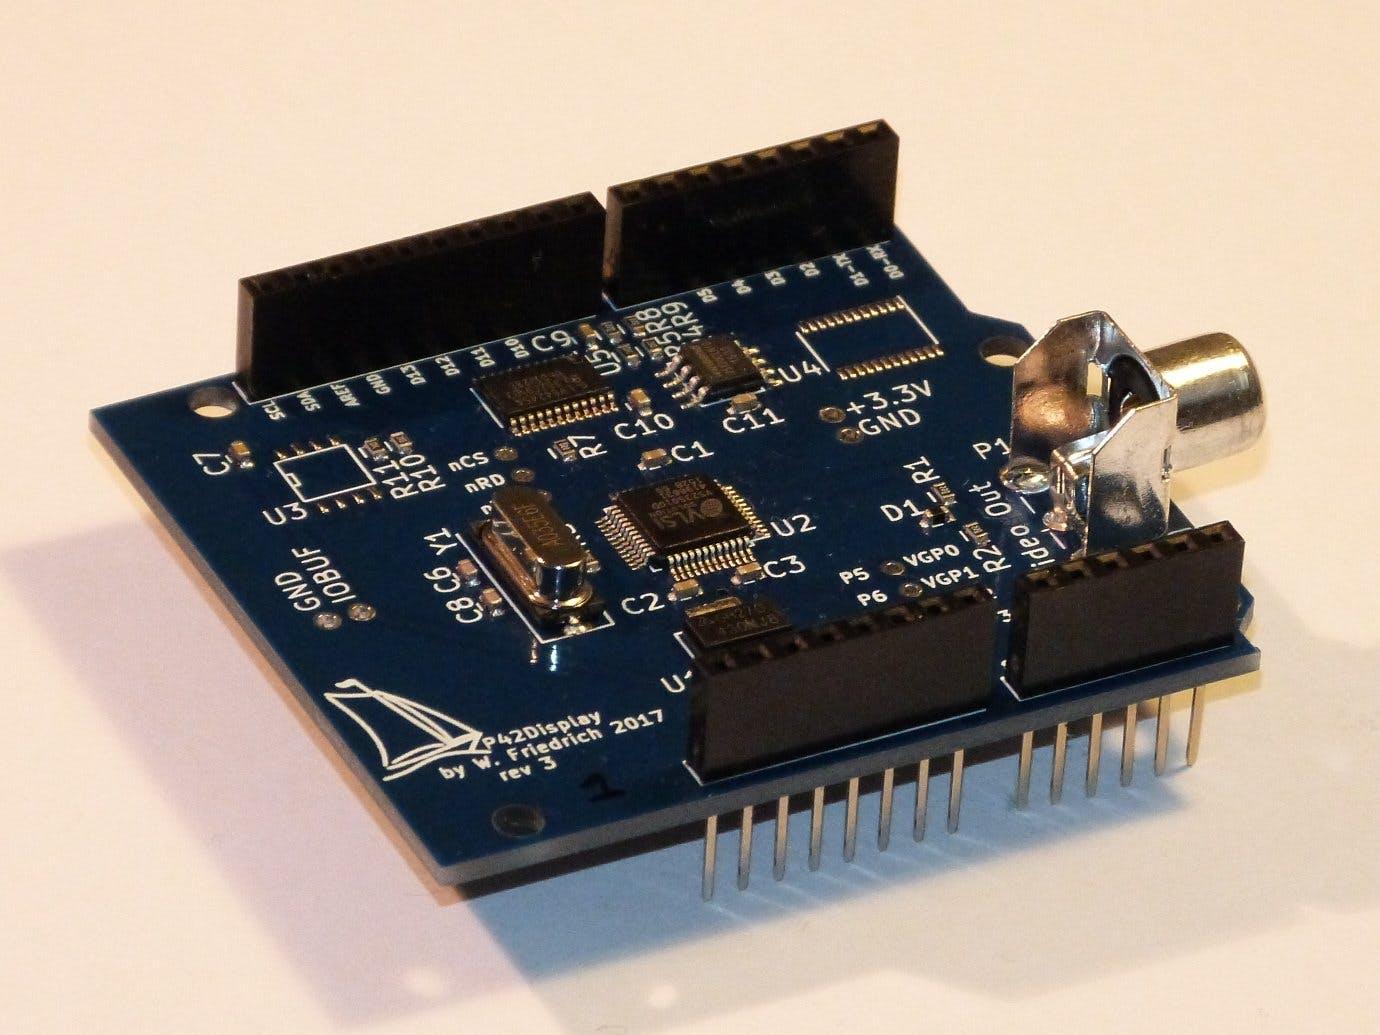 NTSC/PAL Video Display Shield